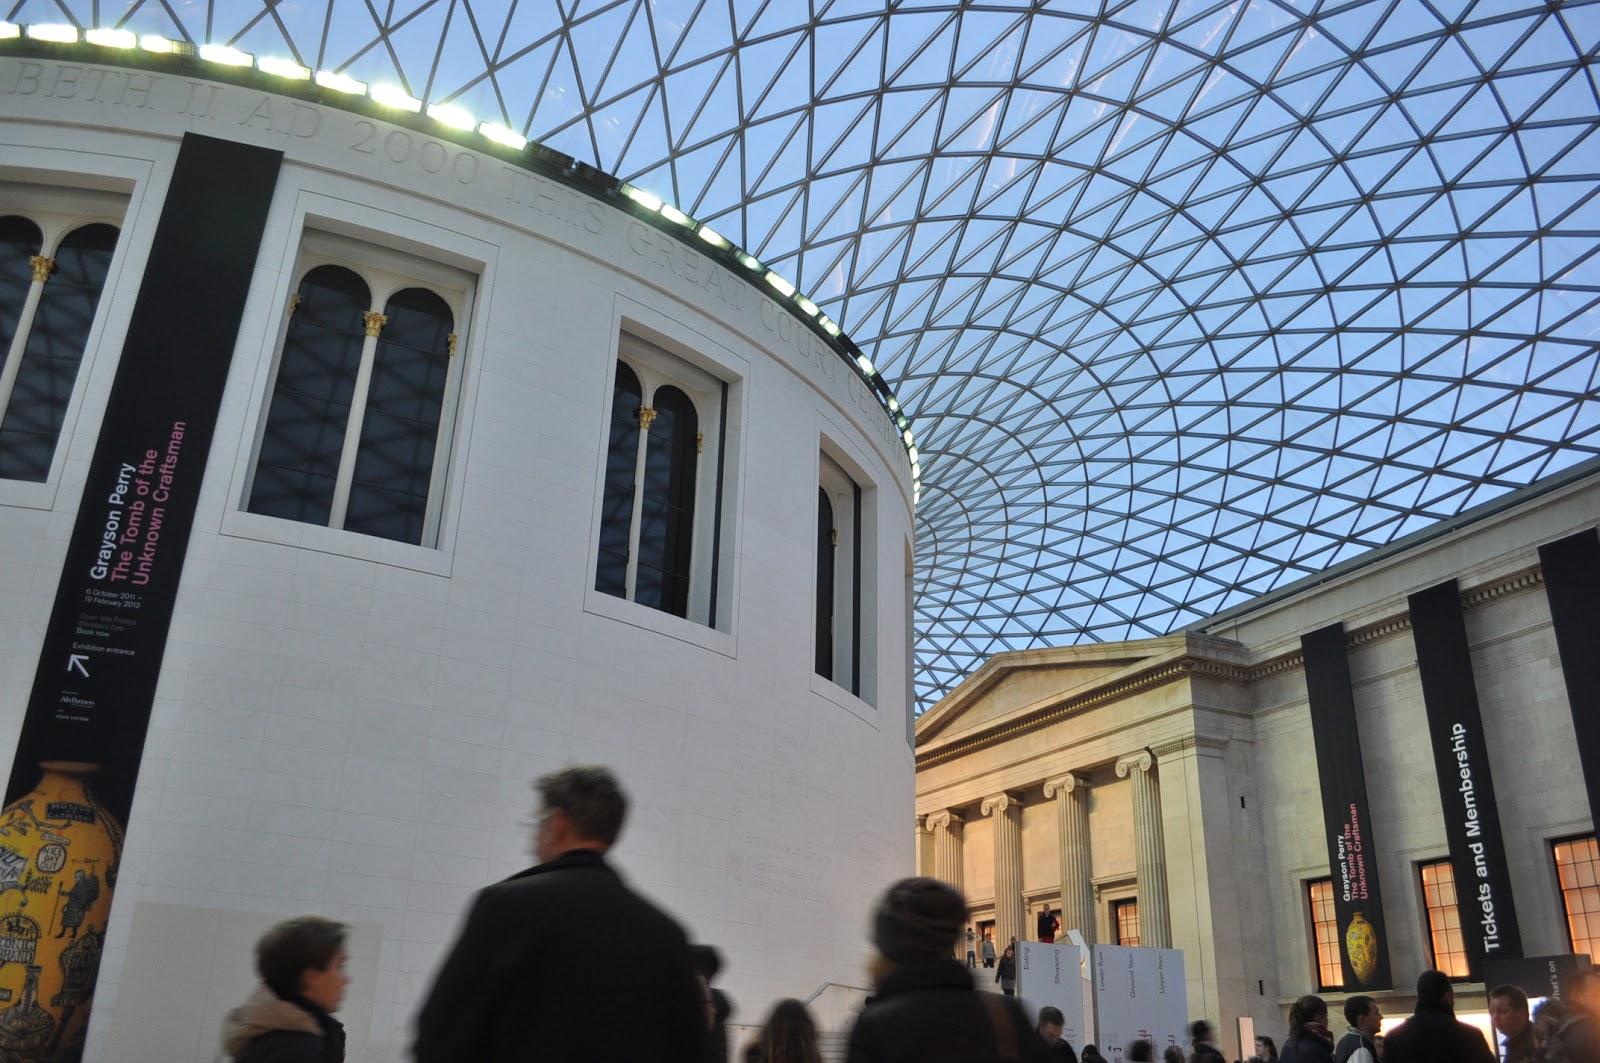 british museum top ten exhibits the must see items if you are in british museum top ten exhibits the must see items if you are in a hurry